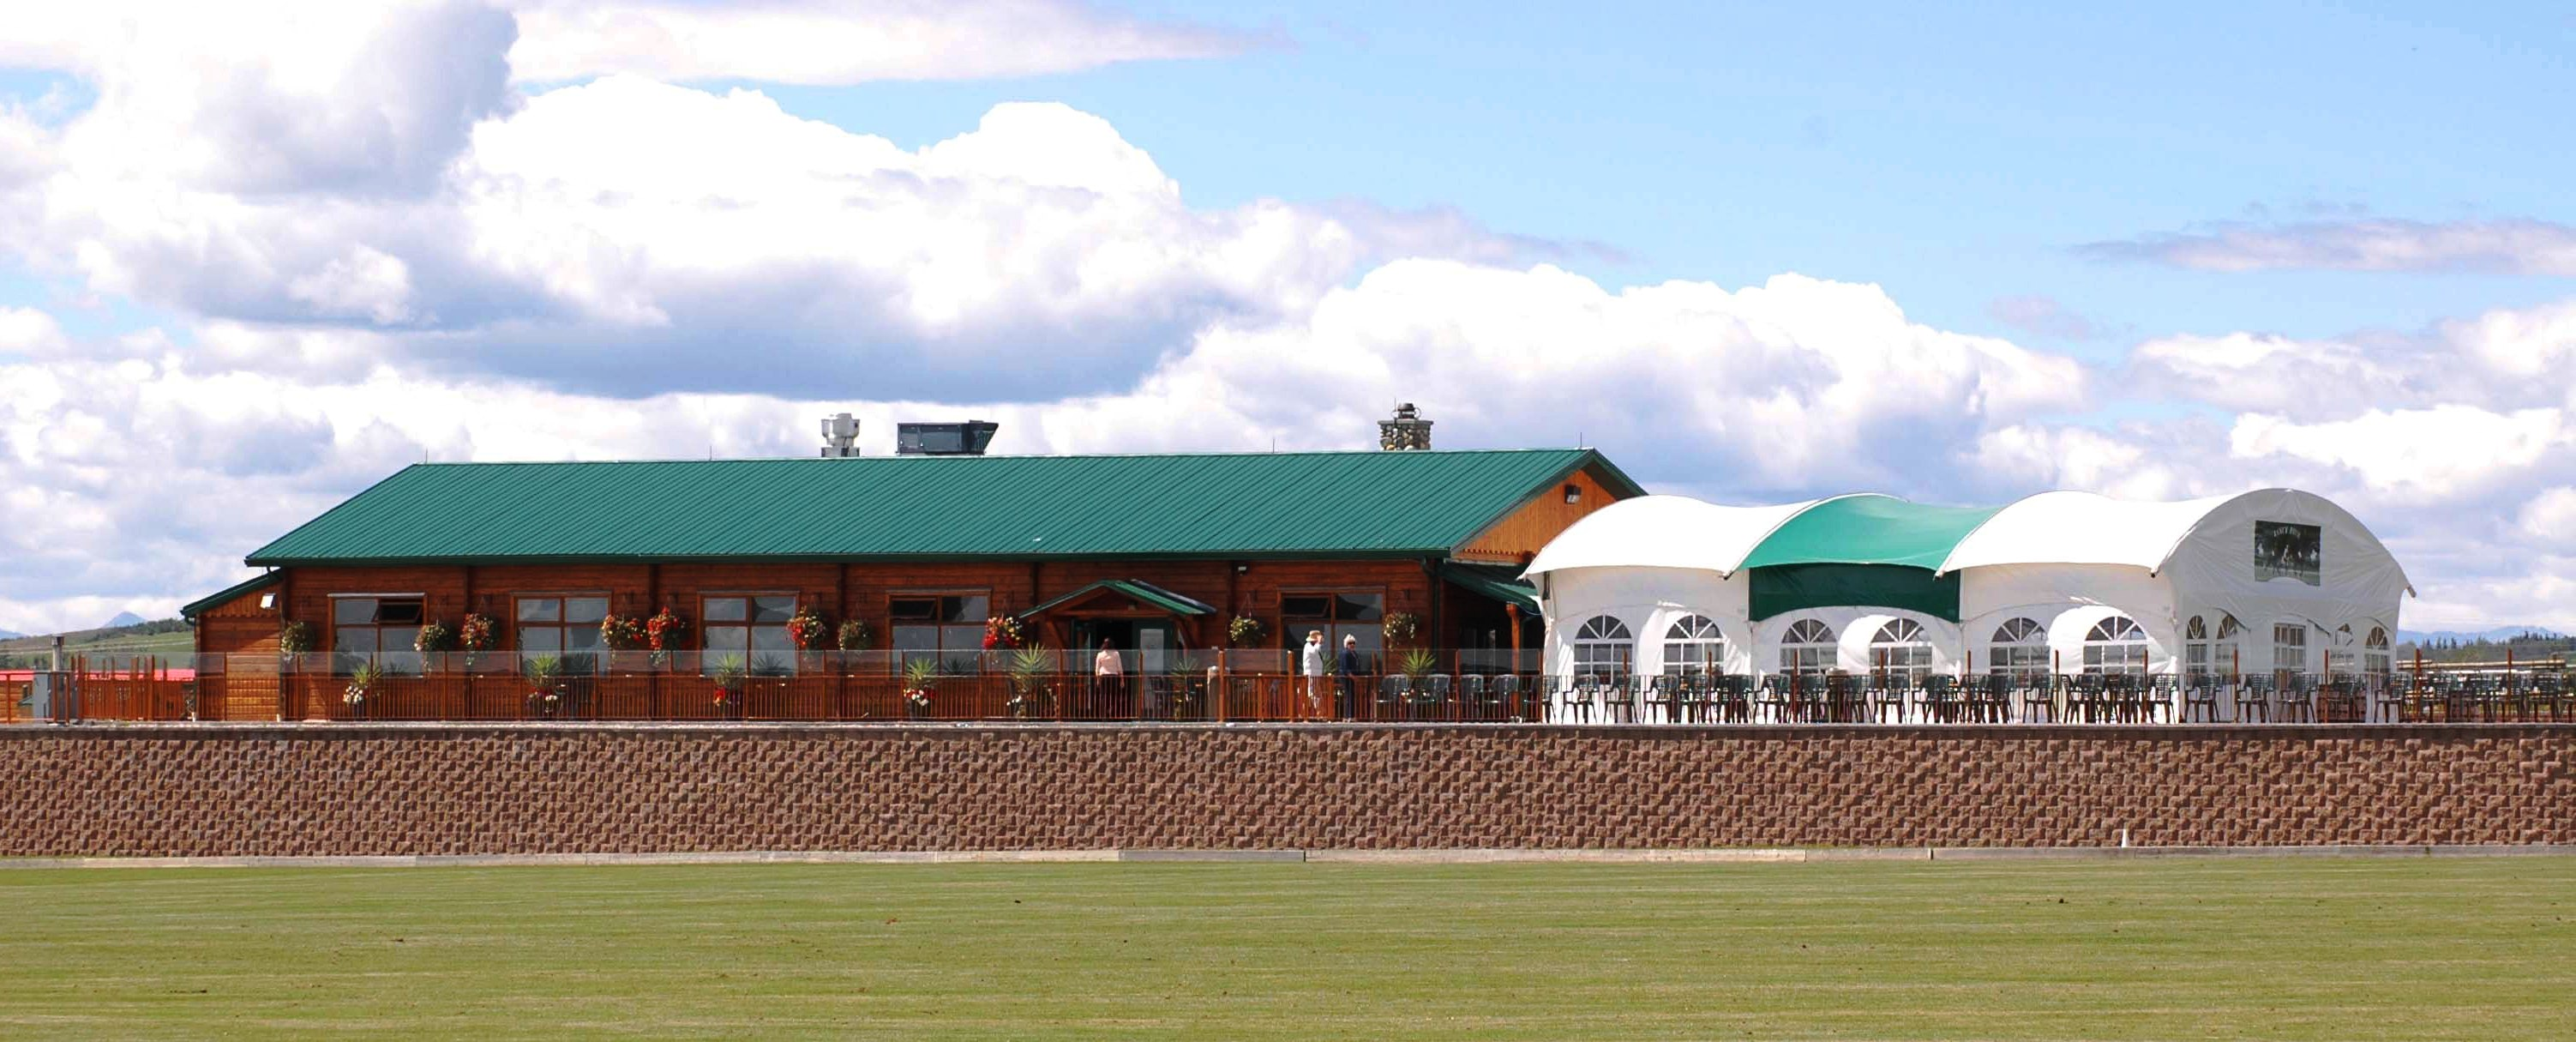 WP Calgary Polo Club Ranch House Exterior Editted